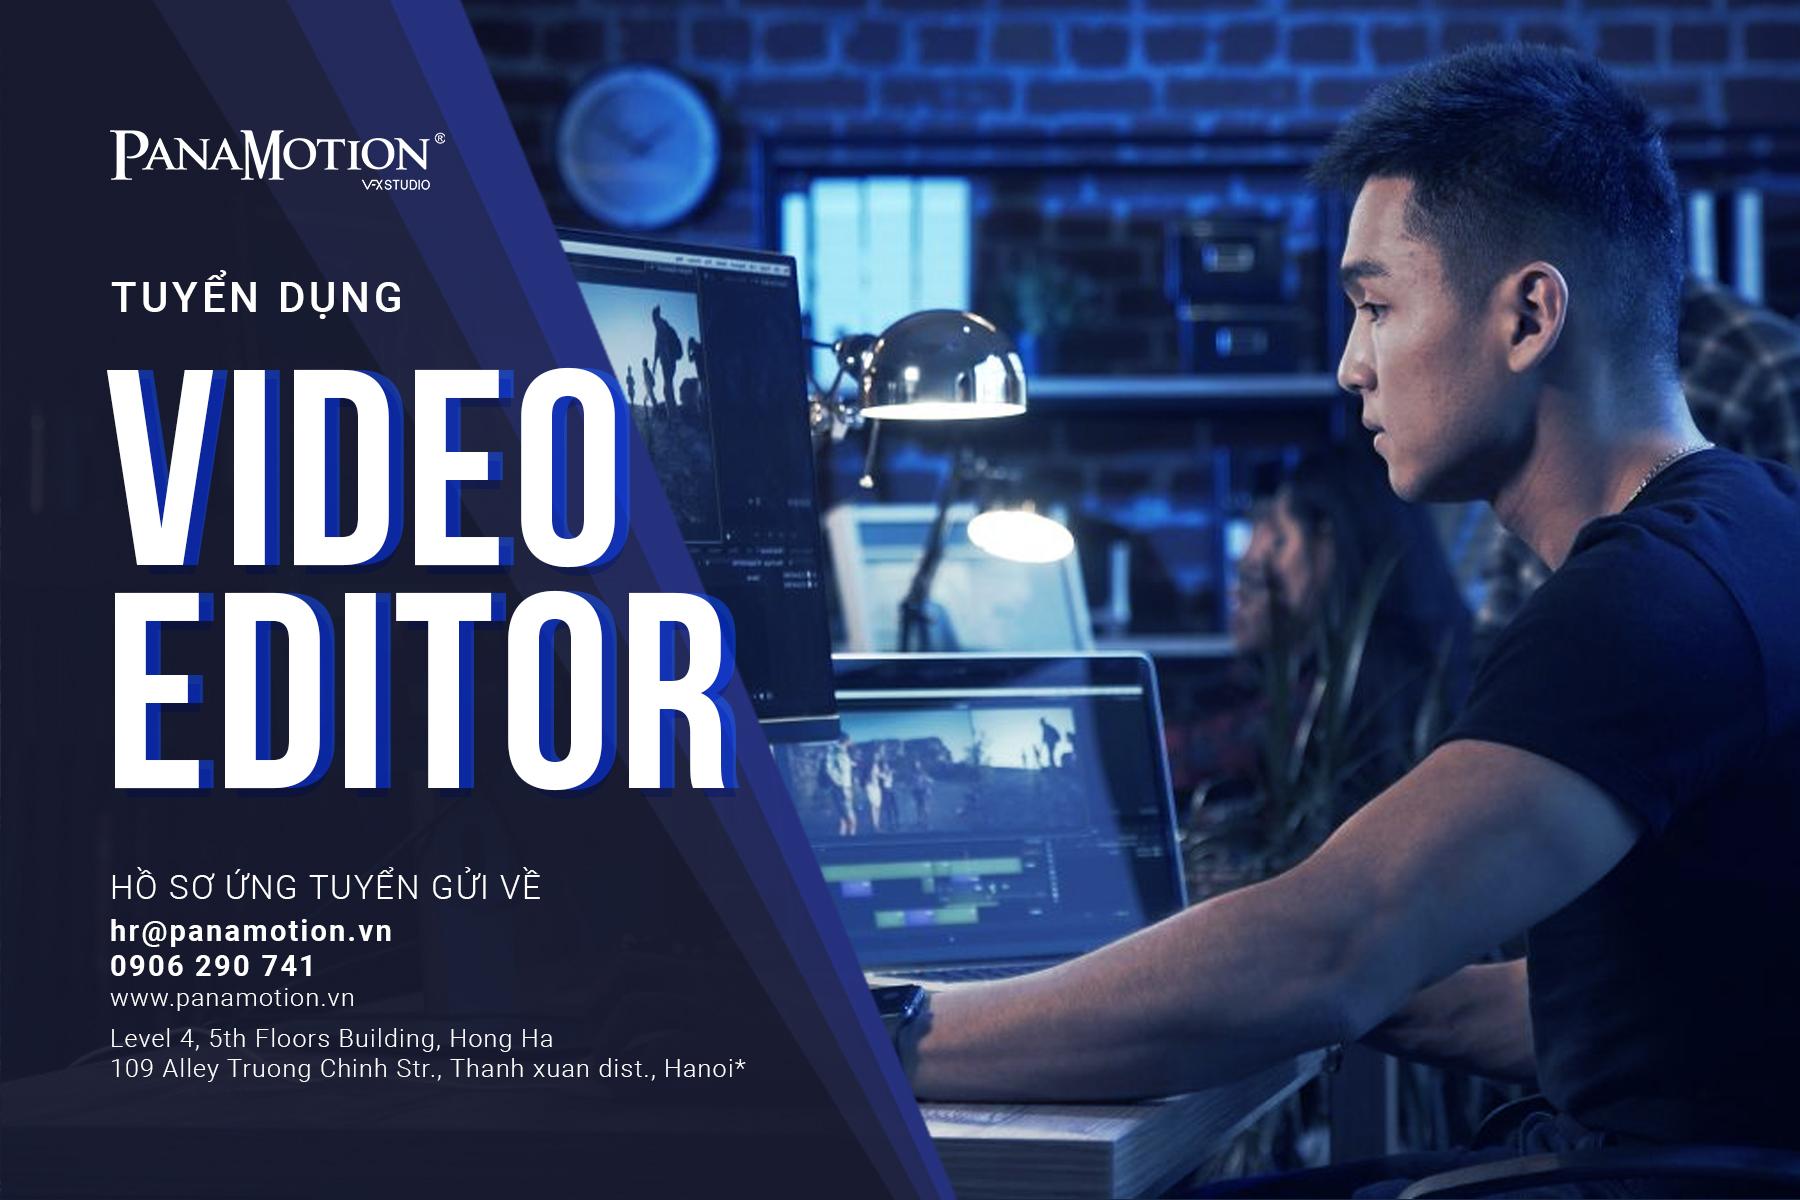 Tuyển Dụng VIDEO EDITOR